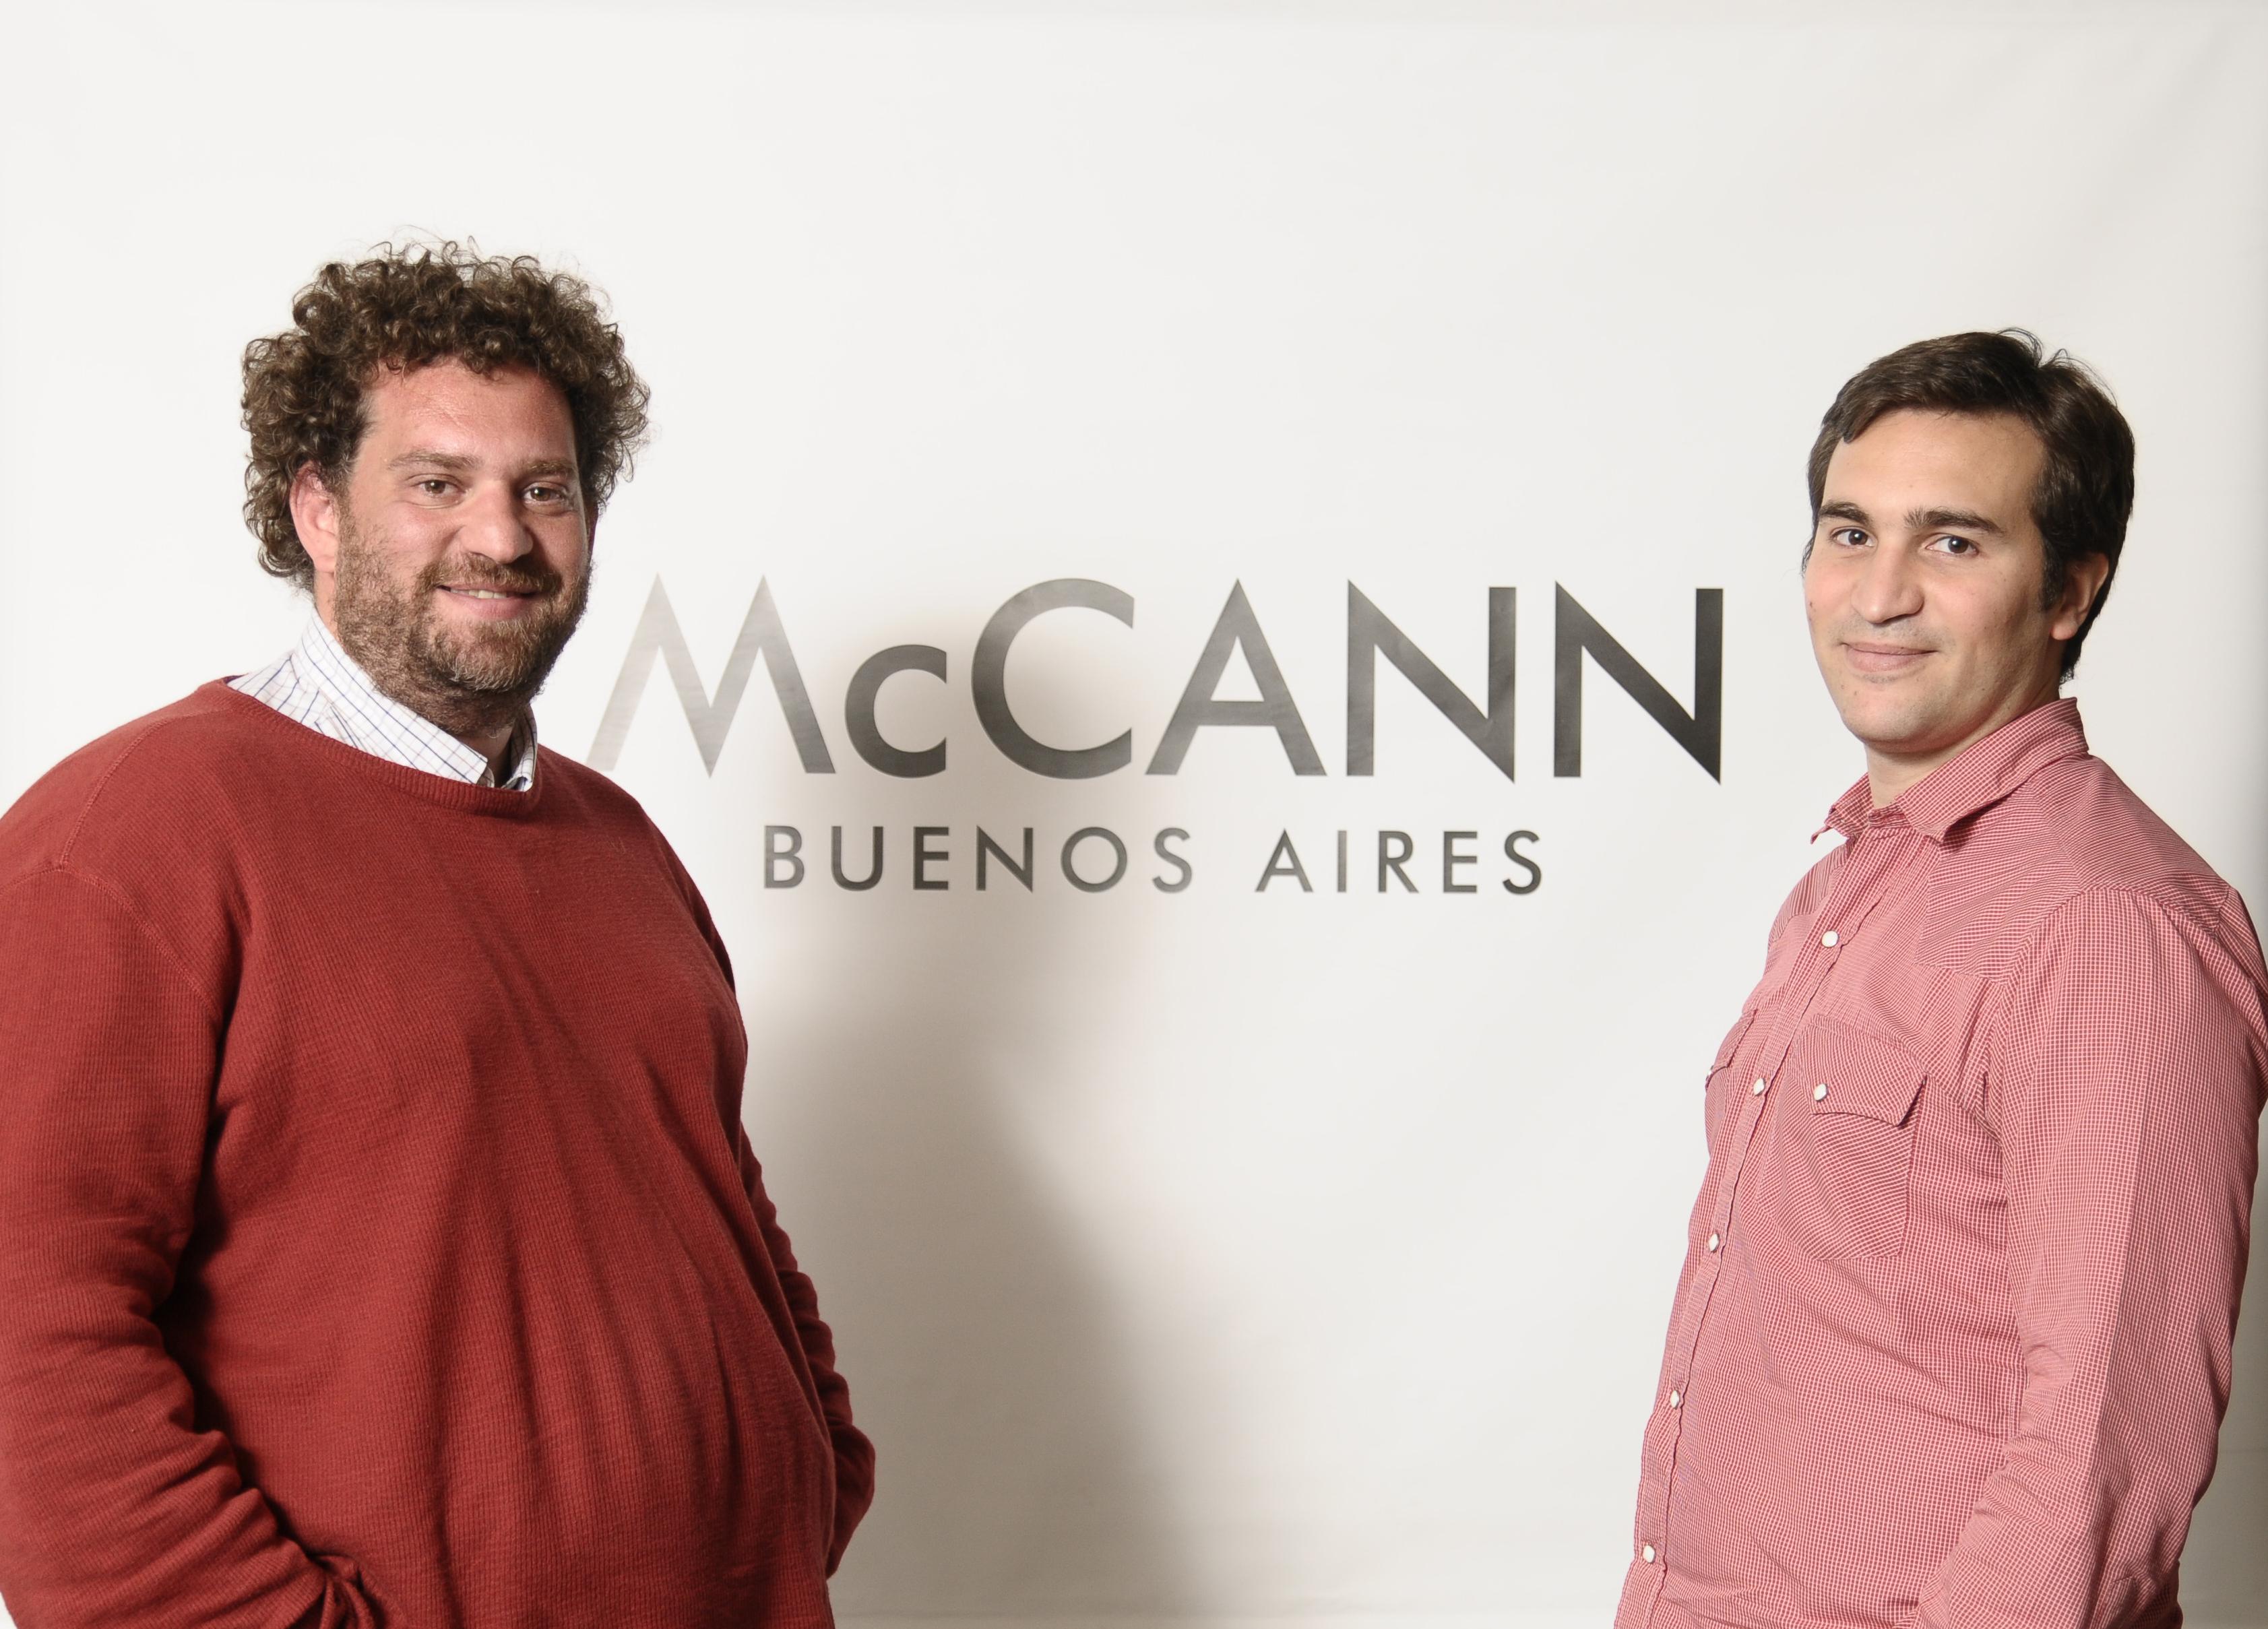 McCann Buenos Aires creates Creative Technological Unit